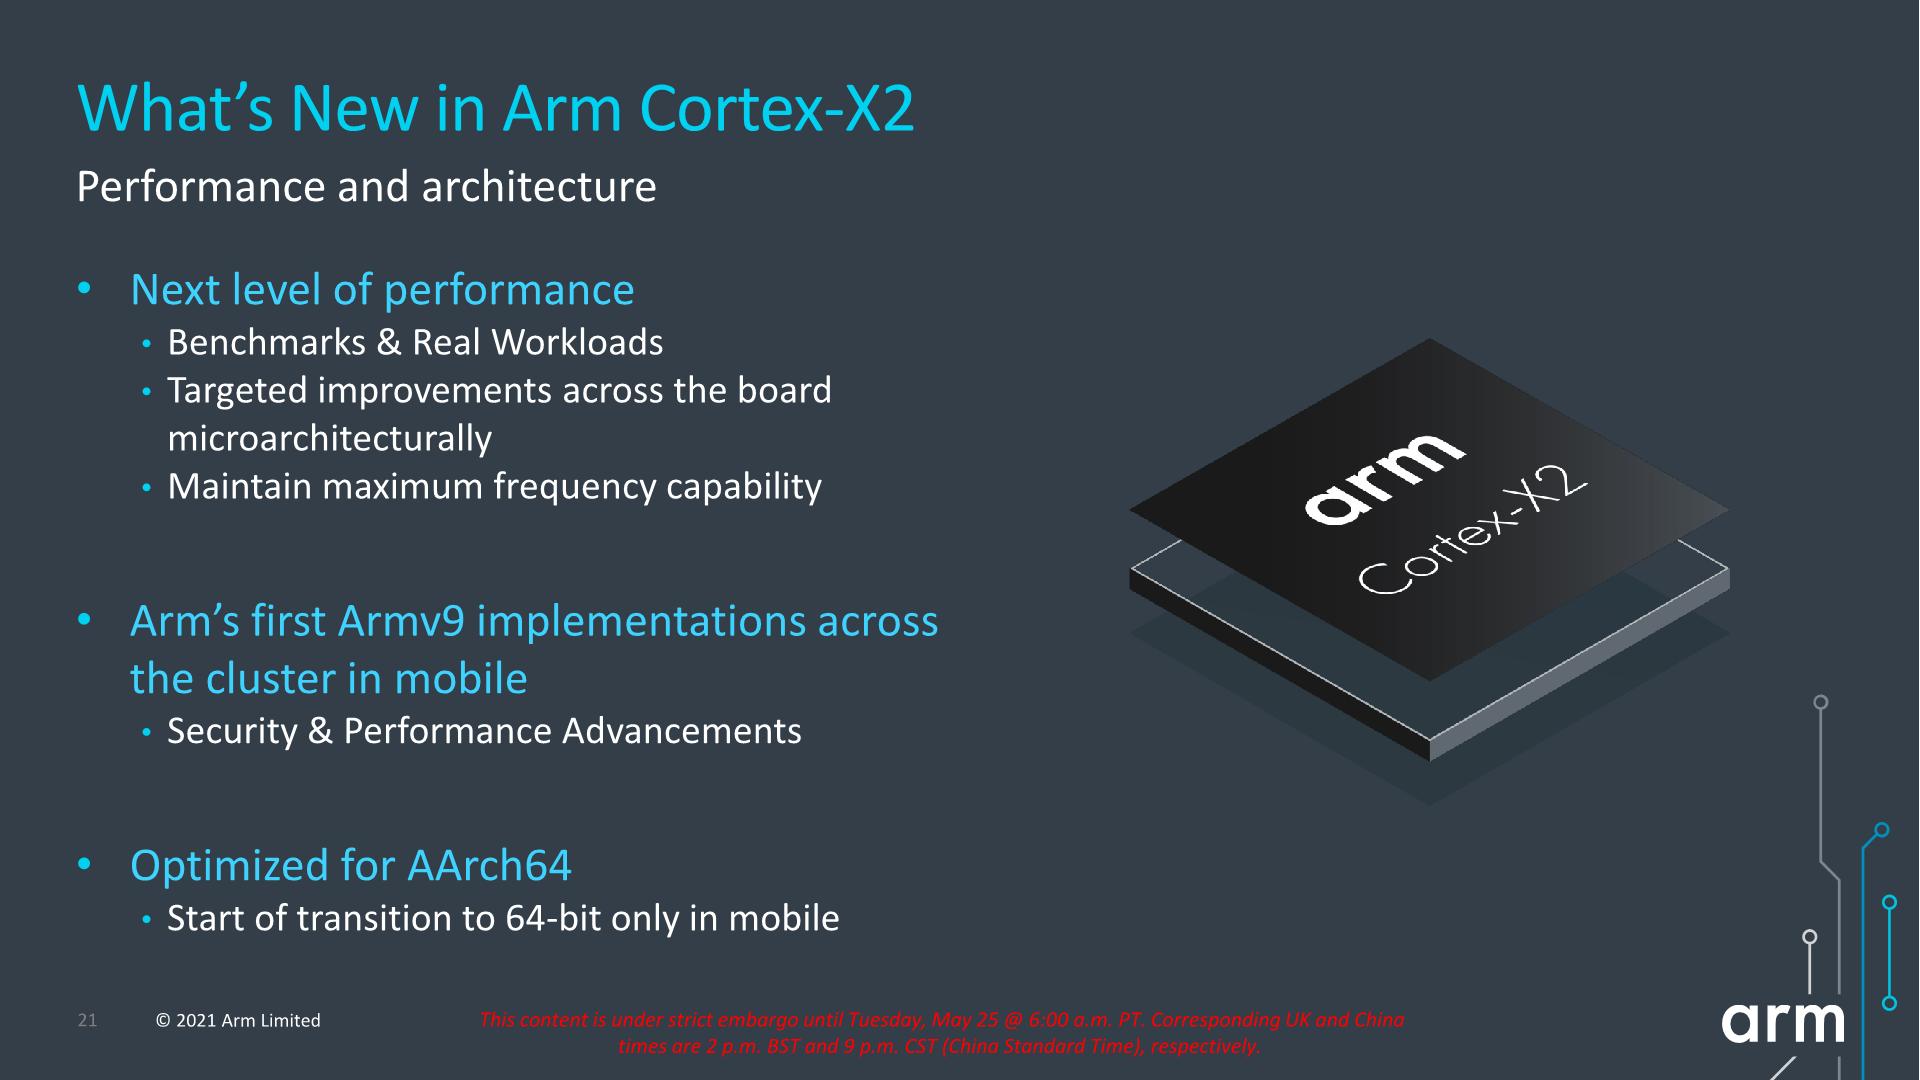 ARM Cortex-X2 Specifications